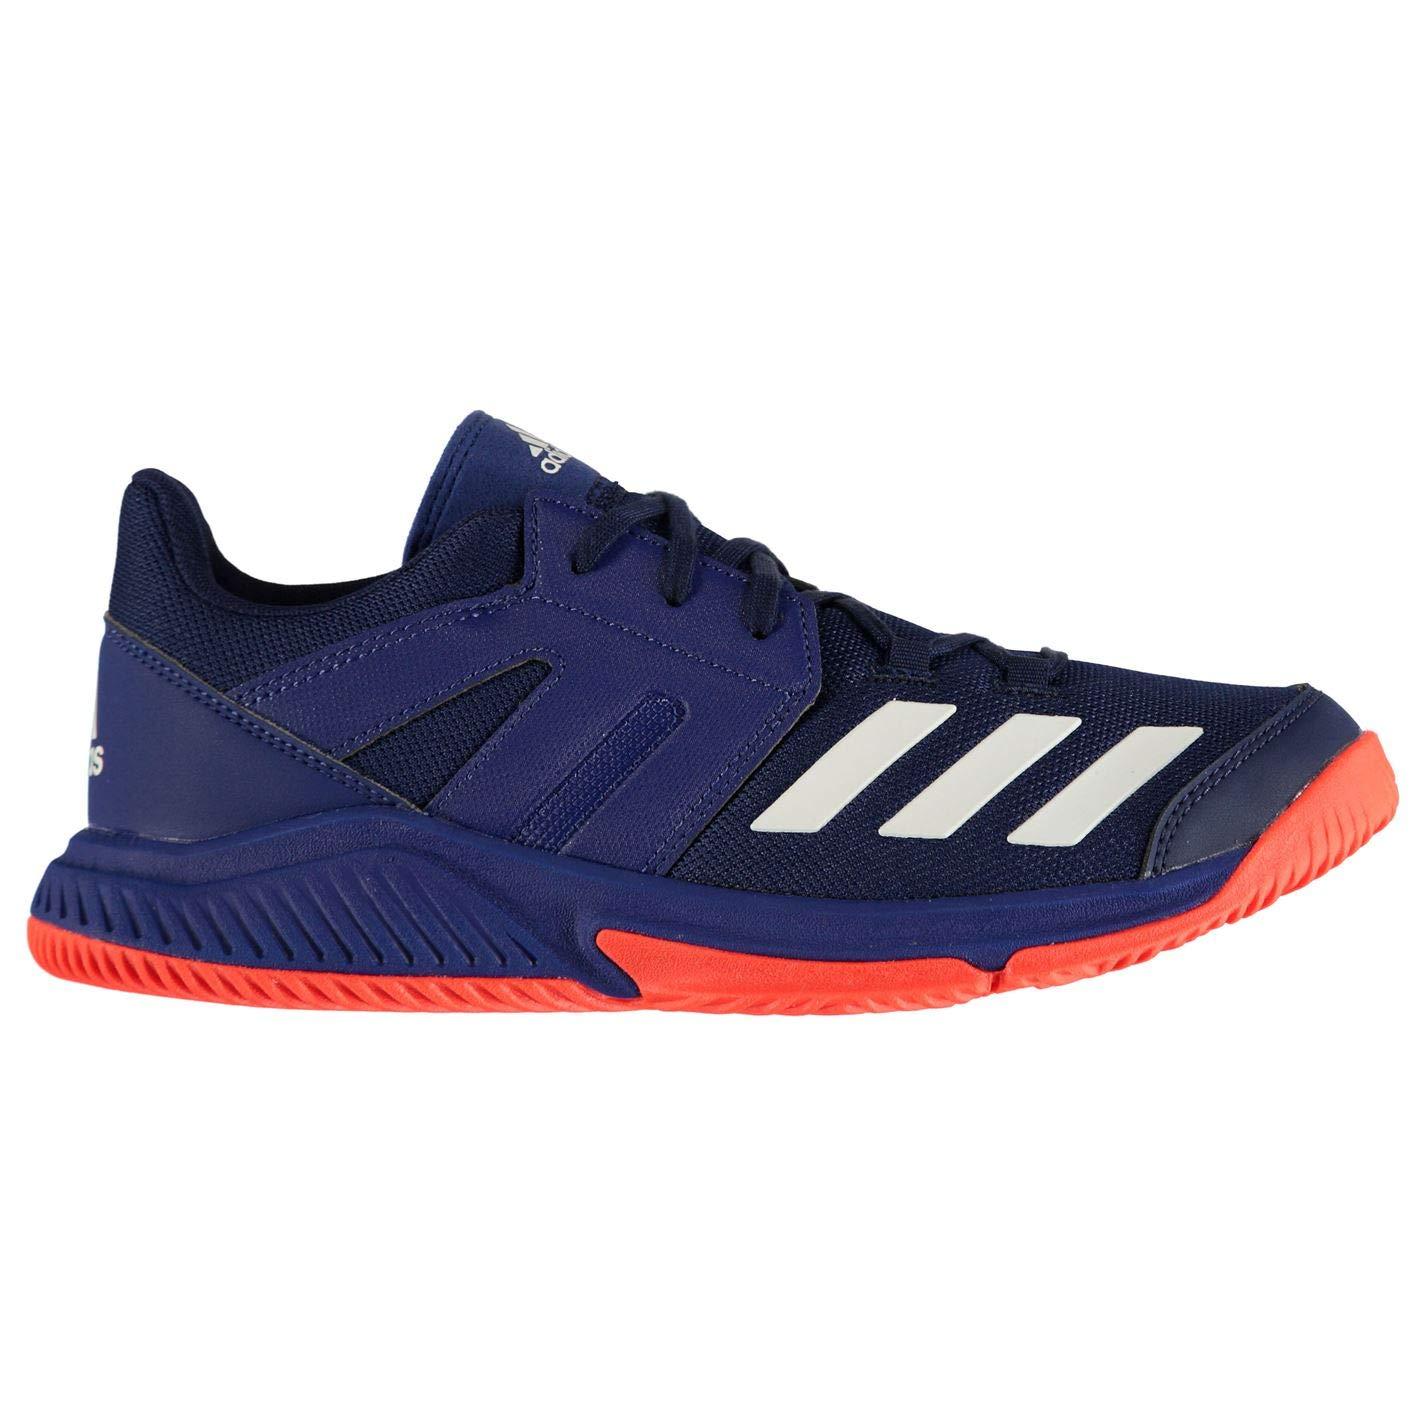 Blau Adidas Herren Essence Handballschuhe